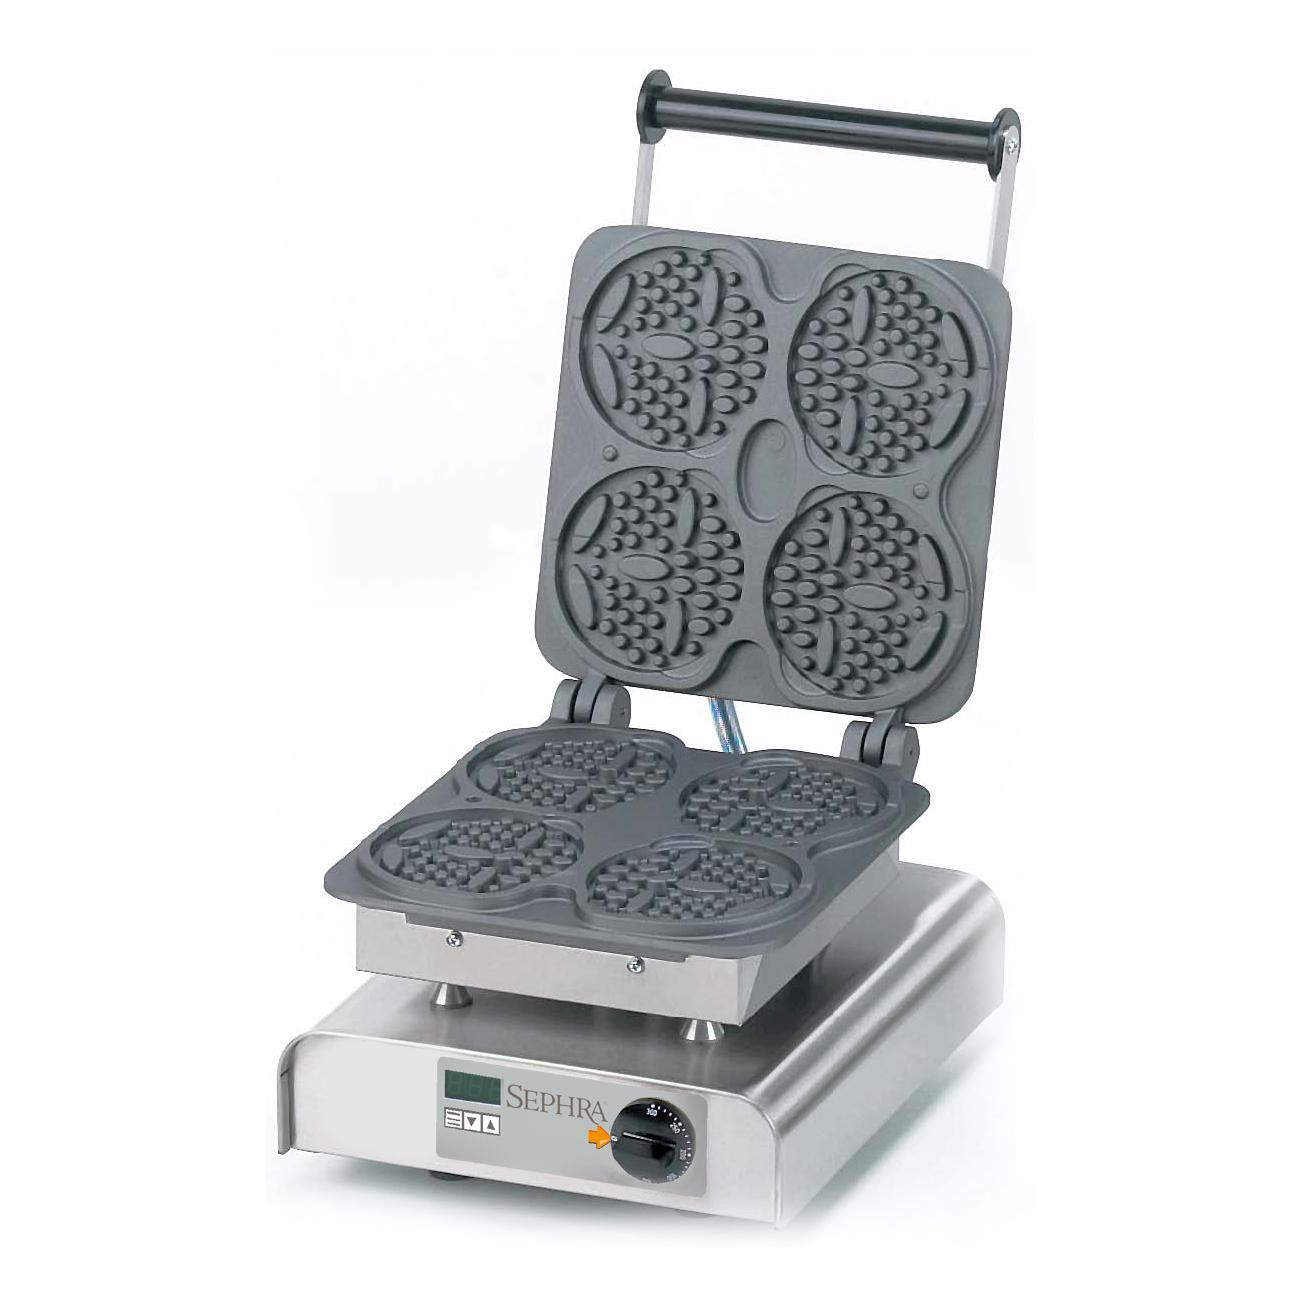 Stick On A Waffle Iron ~ Sephra bear waffle on a stick maker